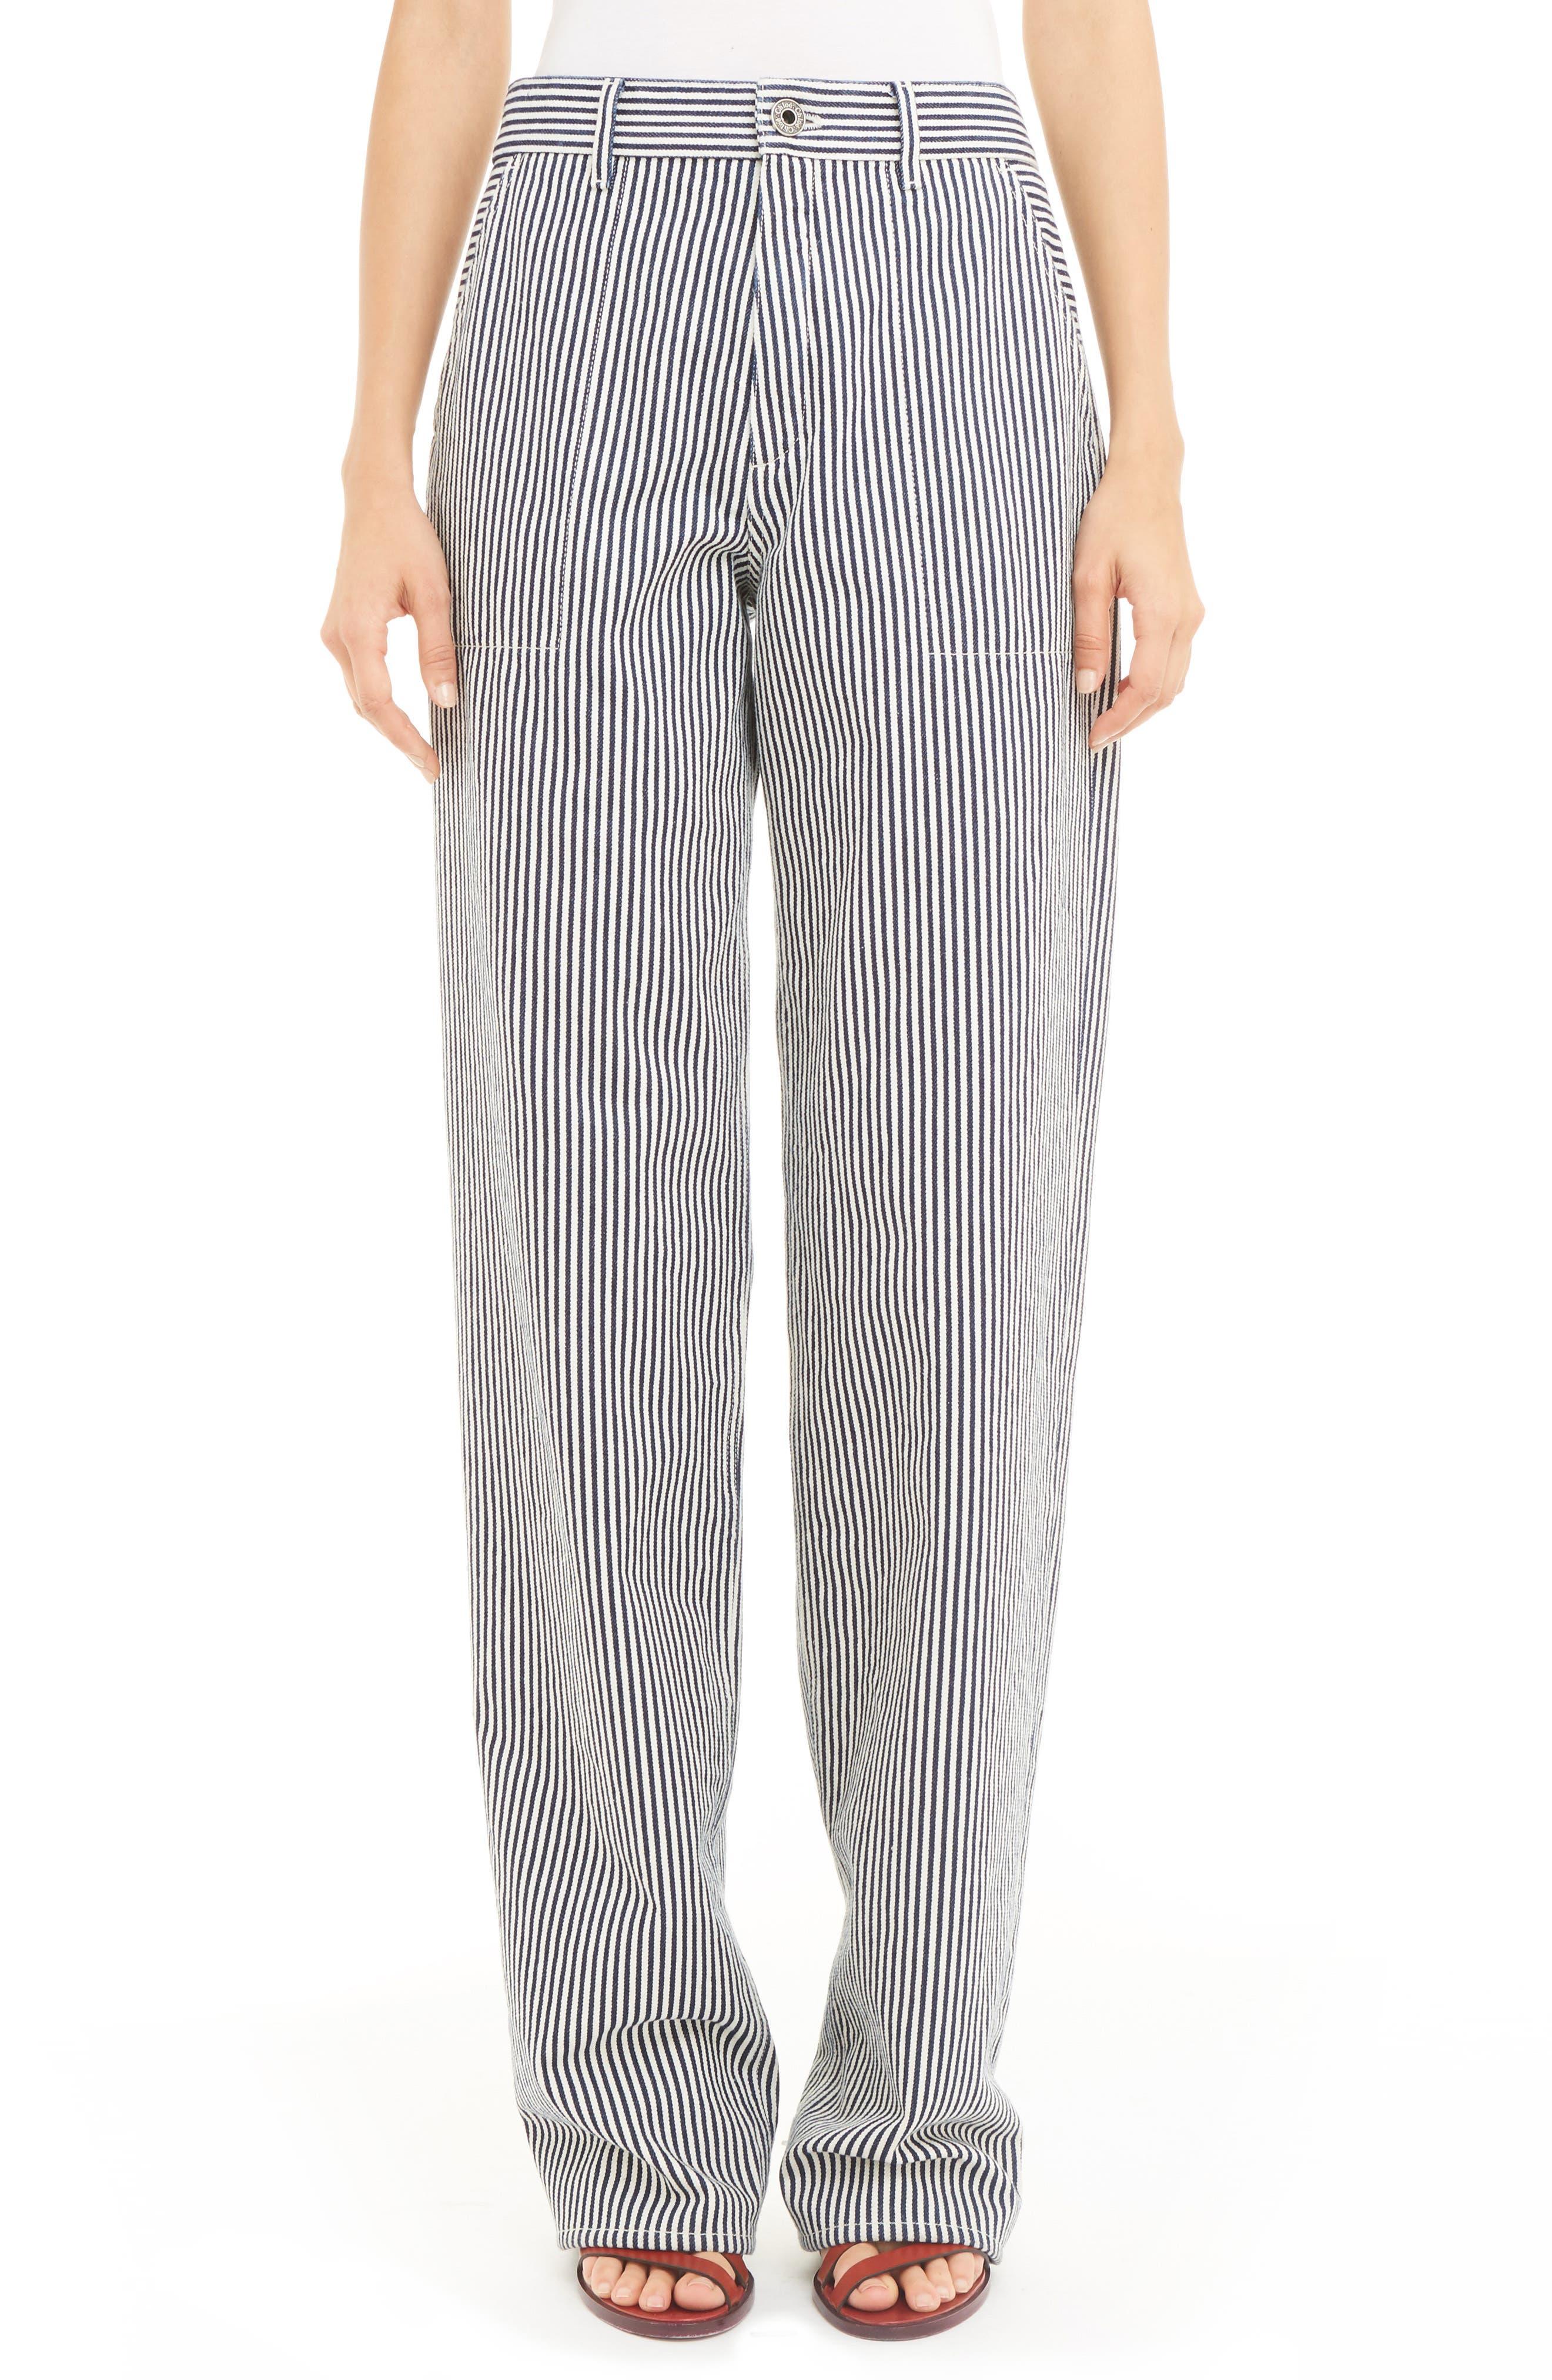 CHLOÉ Stripe Straight Leg Jeans